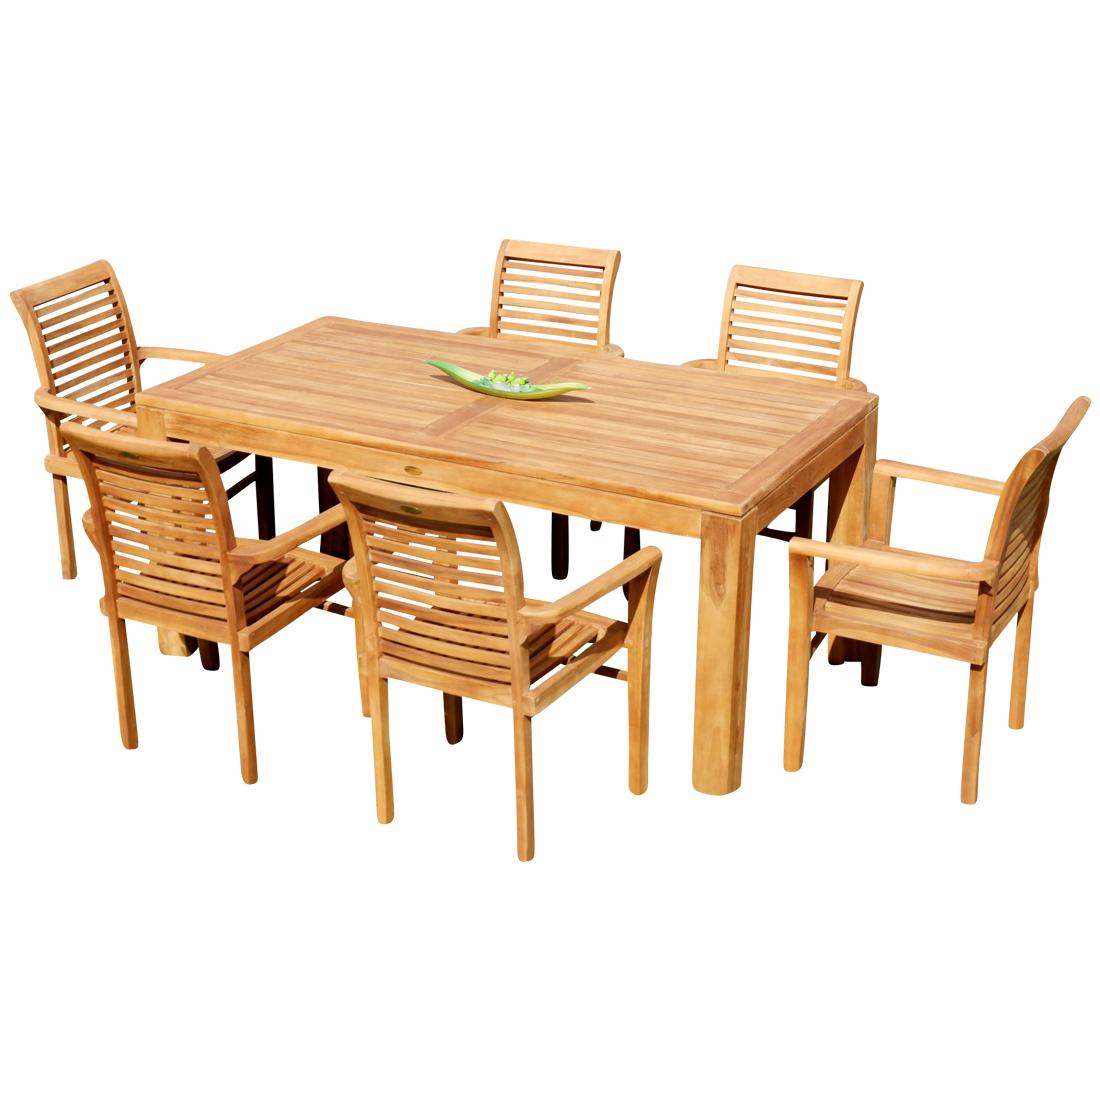 Teak Set Gartengarnitur Bigfuss Tisch 180x90 Cm 6 Sessel Holz Jav